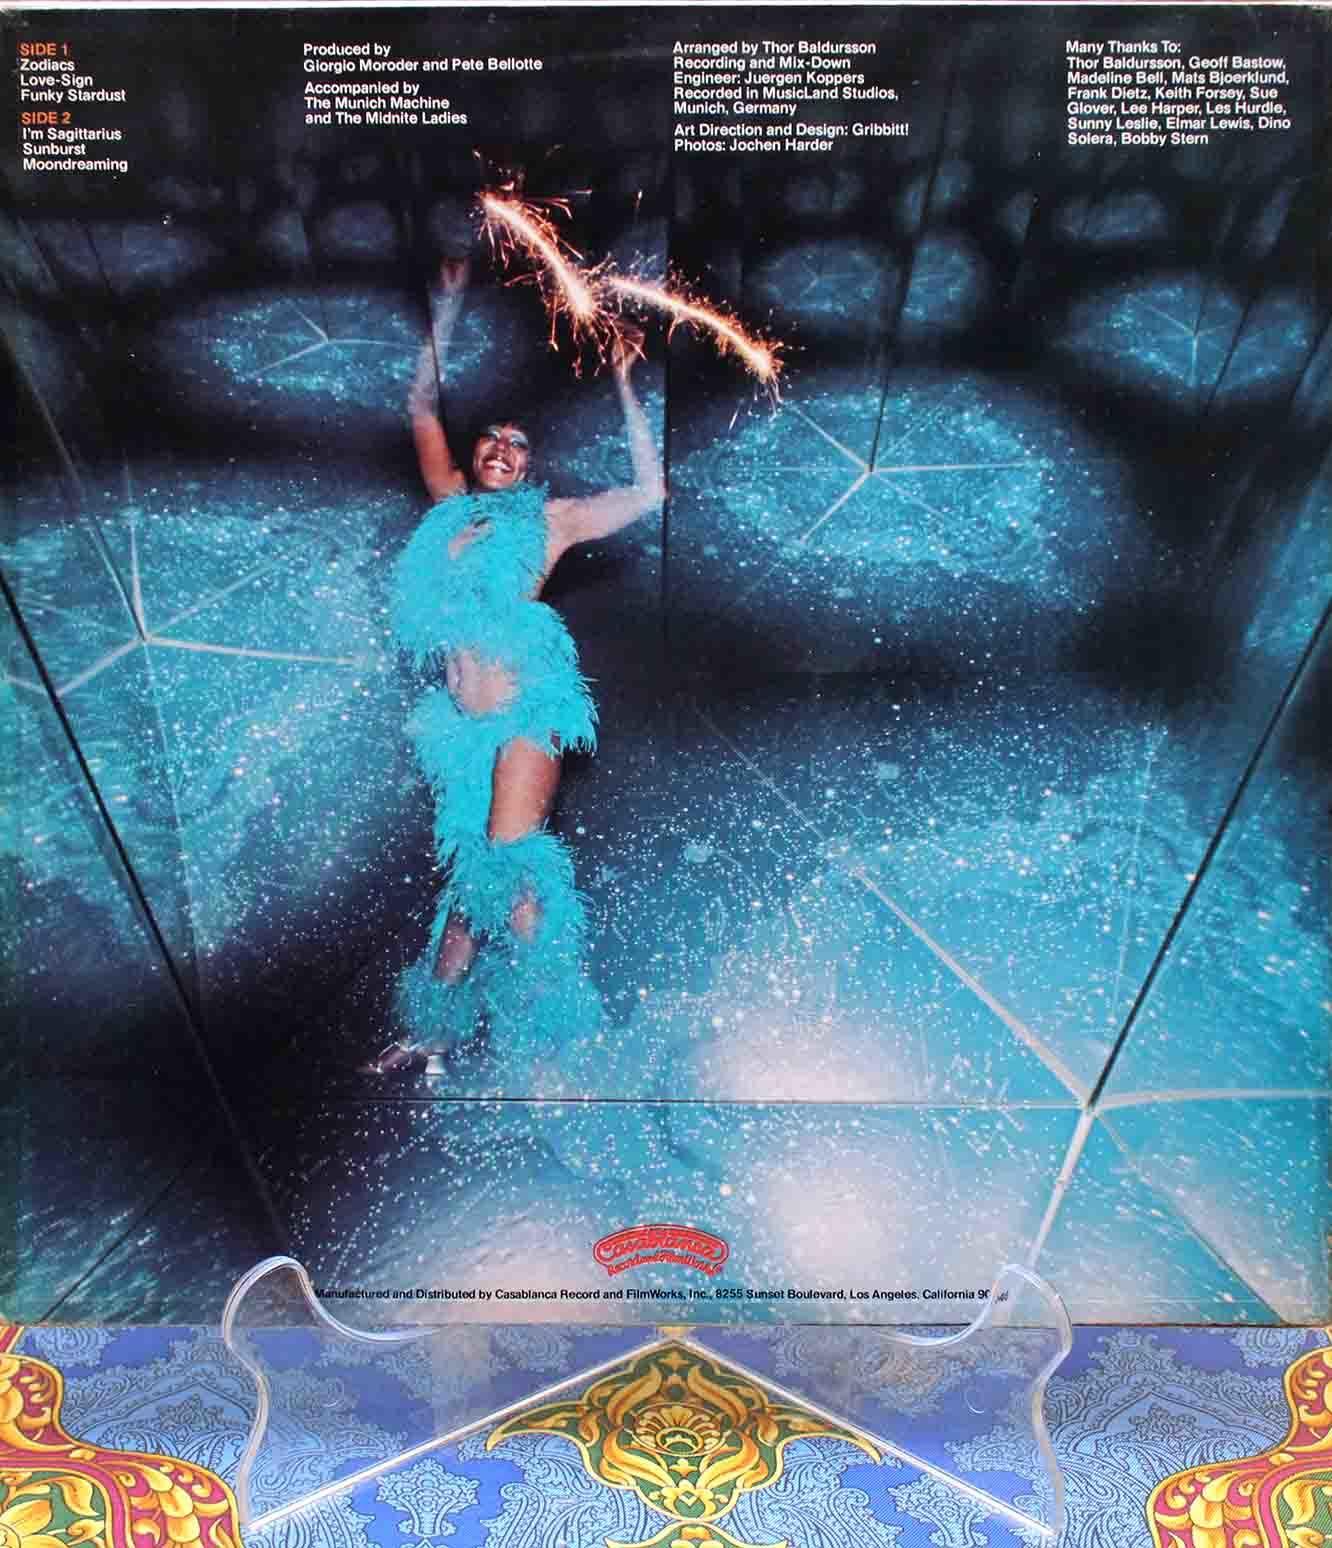 Roberta Kelly - Zodiac 02